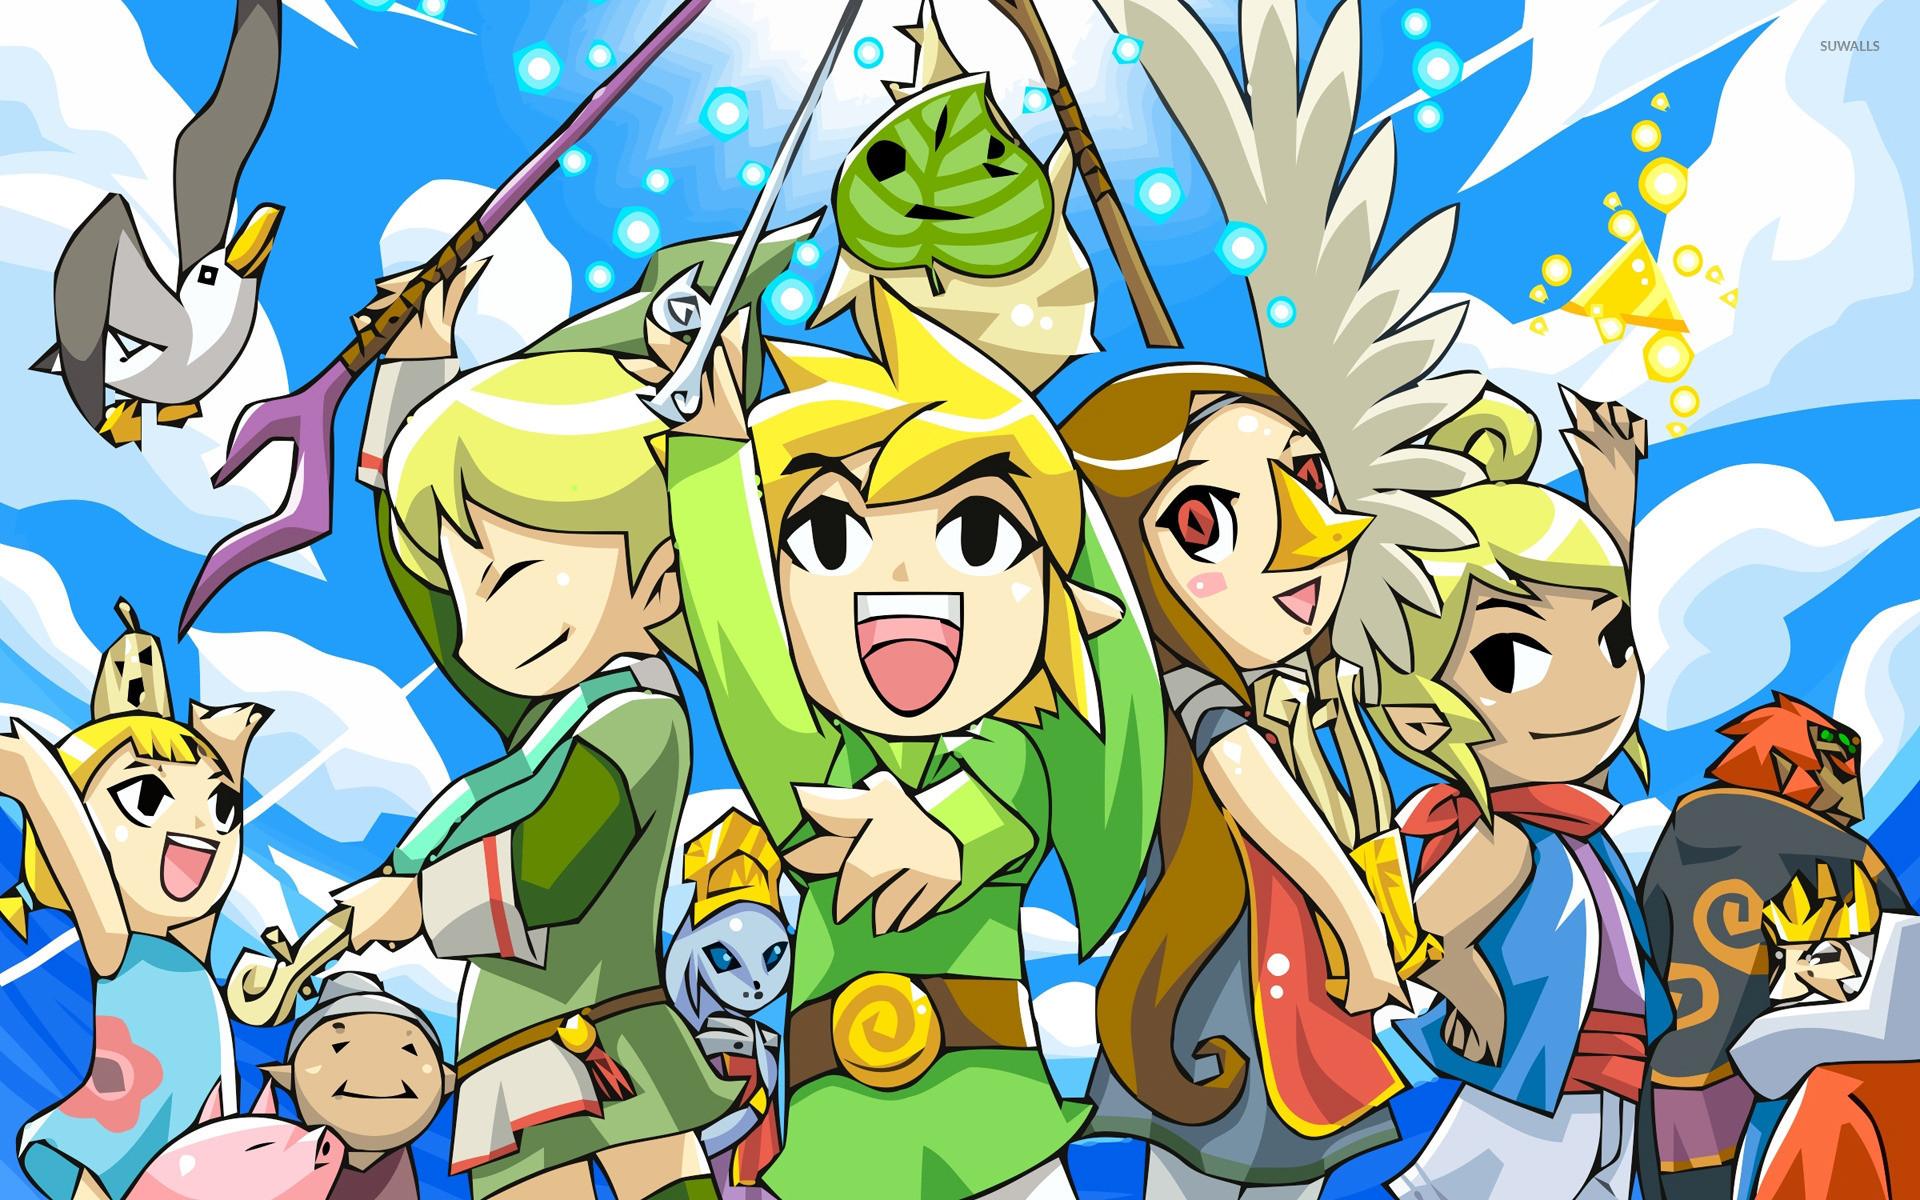 Res: 1920x1200, The Legend Of Zelda: A Link Between Worlds HD Wallpapers